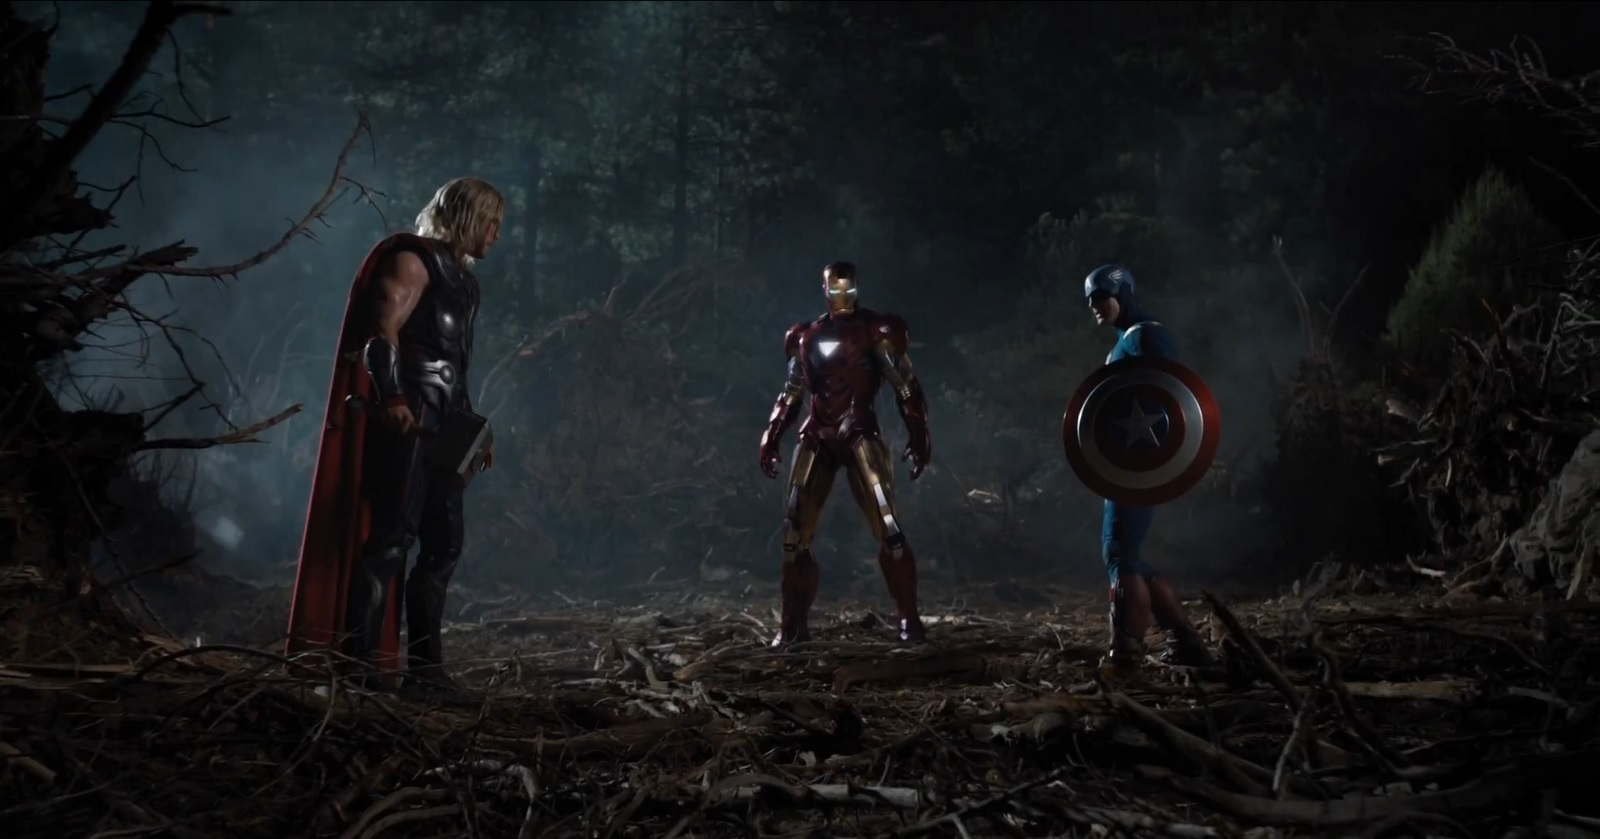 12. The Avengers